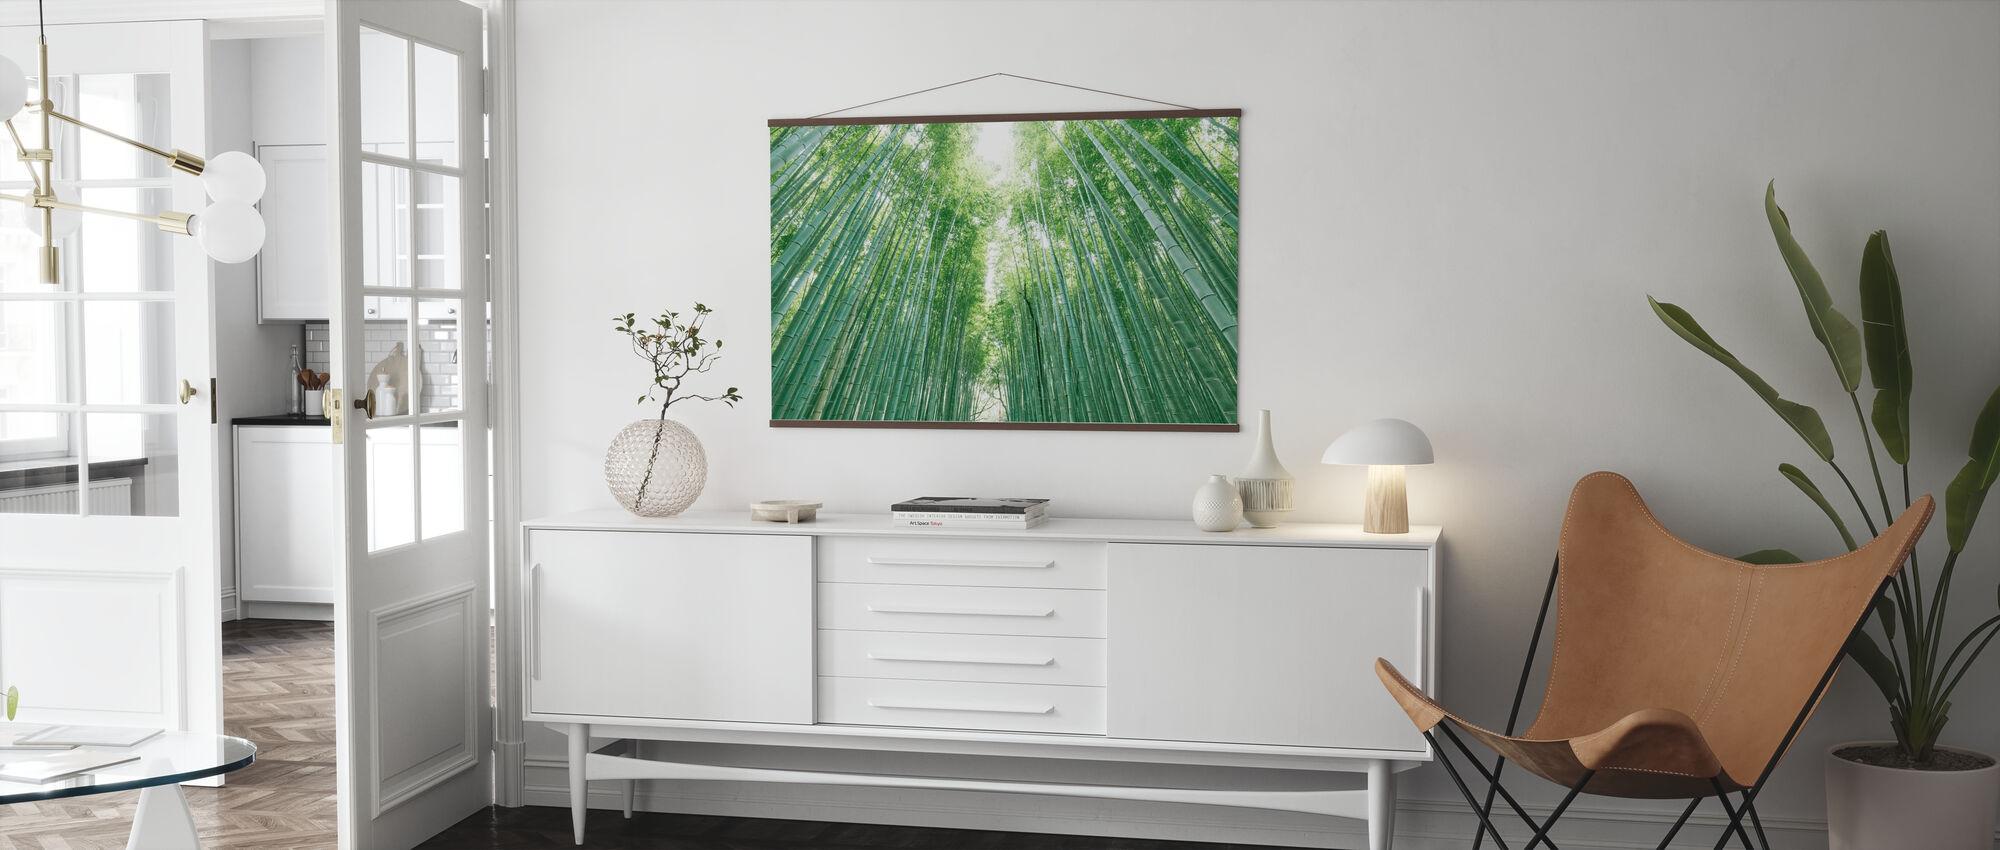 Bambus skog - Plakat - Stue